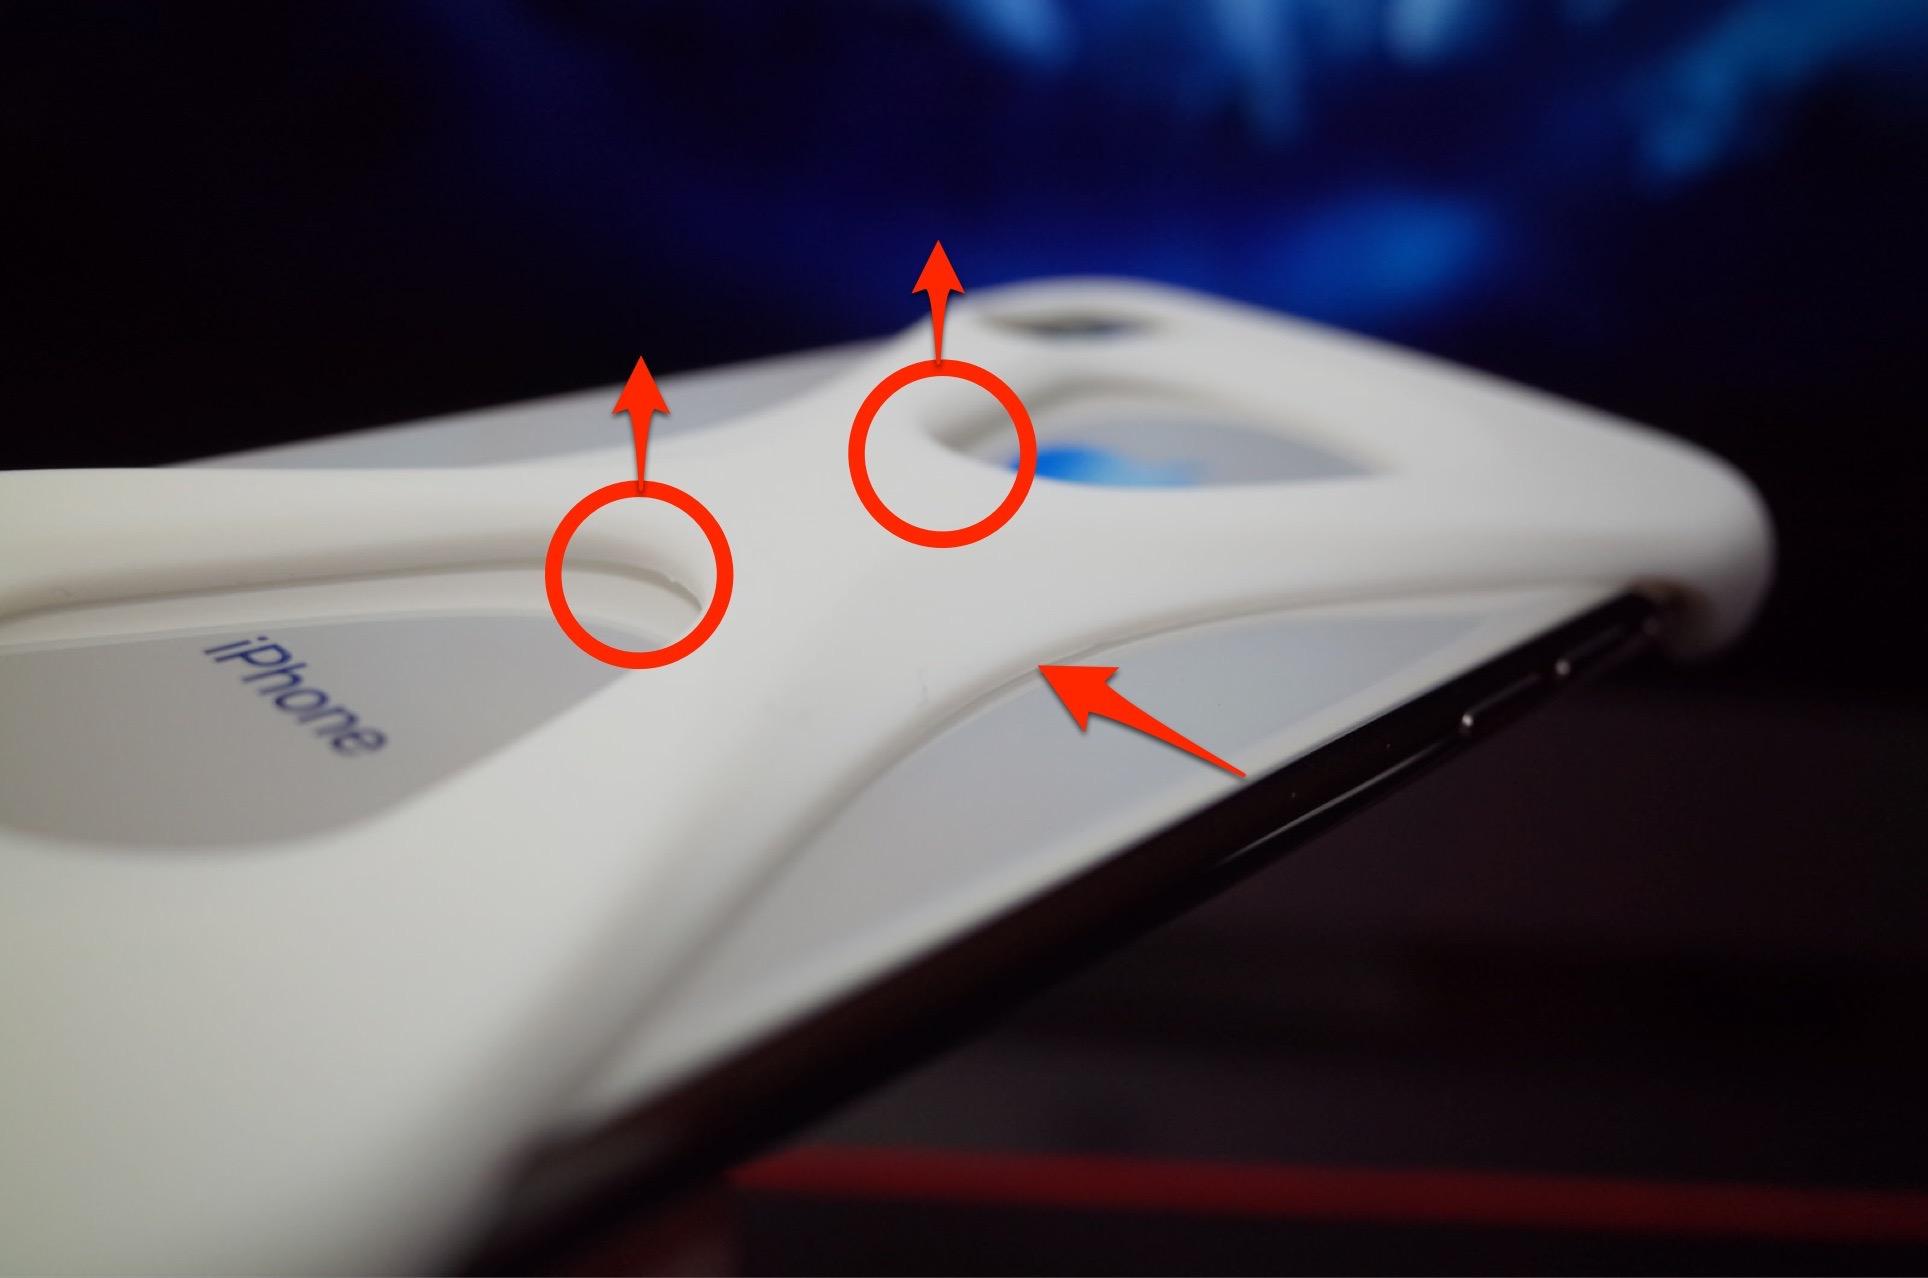 Palmo パルモ スマホケース iPhone XS/X 対応 ホワイト 白−15